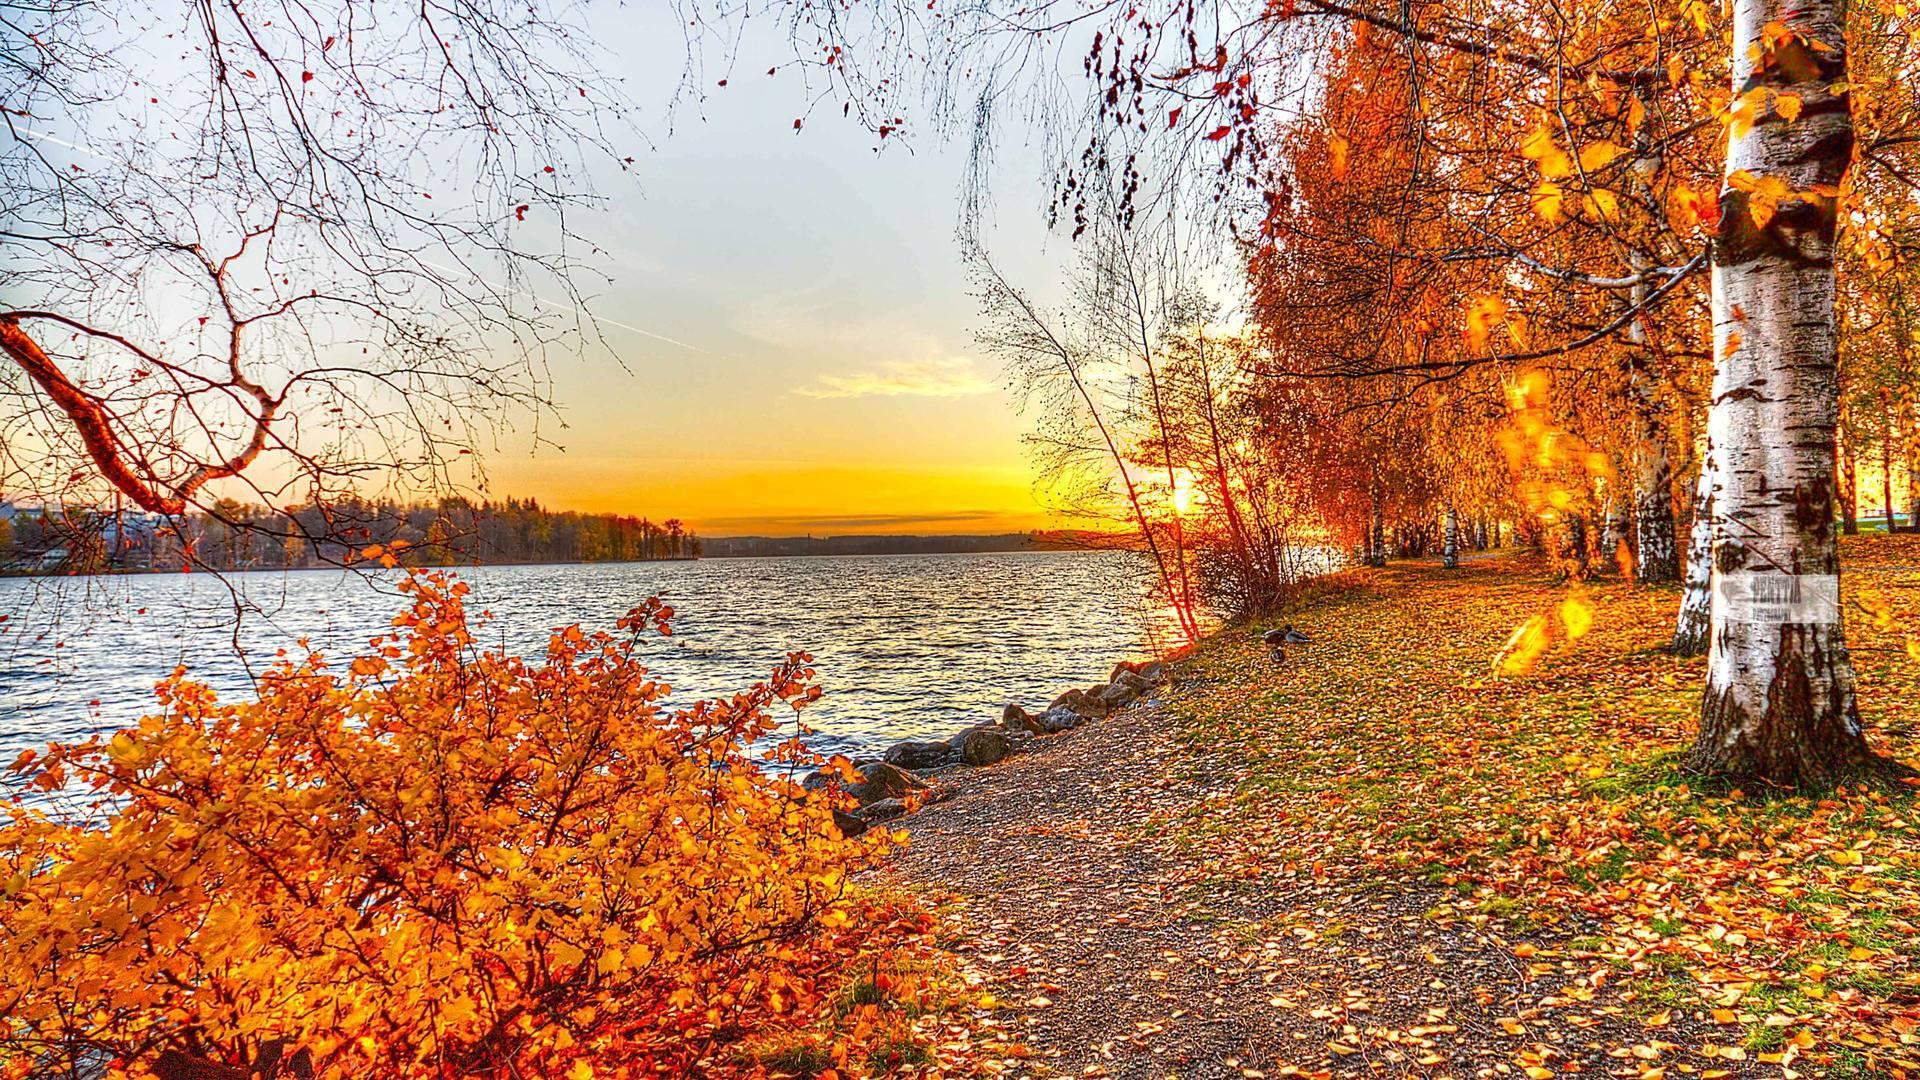 Download Autumn Desktop Wallpaper Hd Backgrounds Download